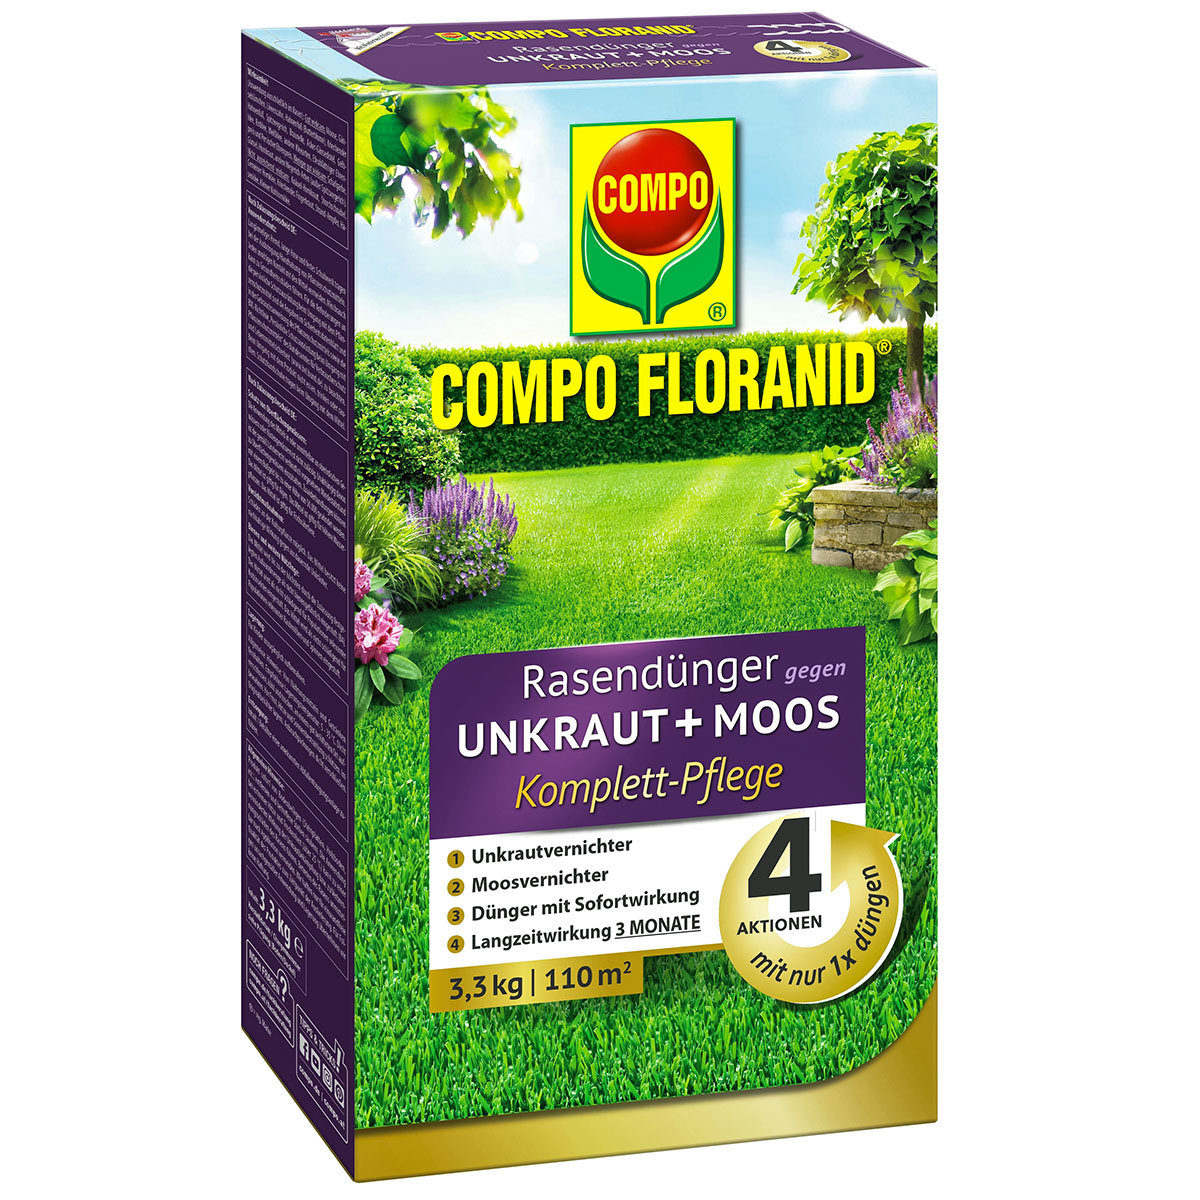 Floranid Rasendünger gegen Unkraut + Moos, 3,3 kg